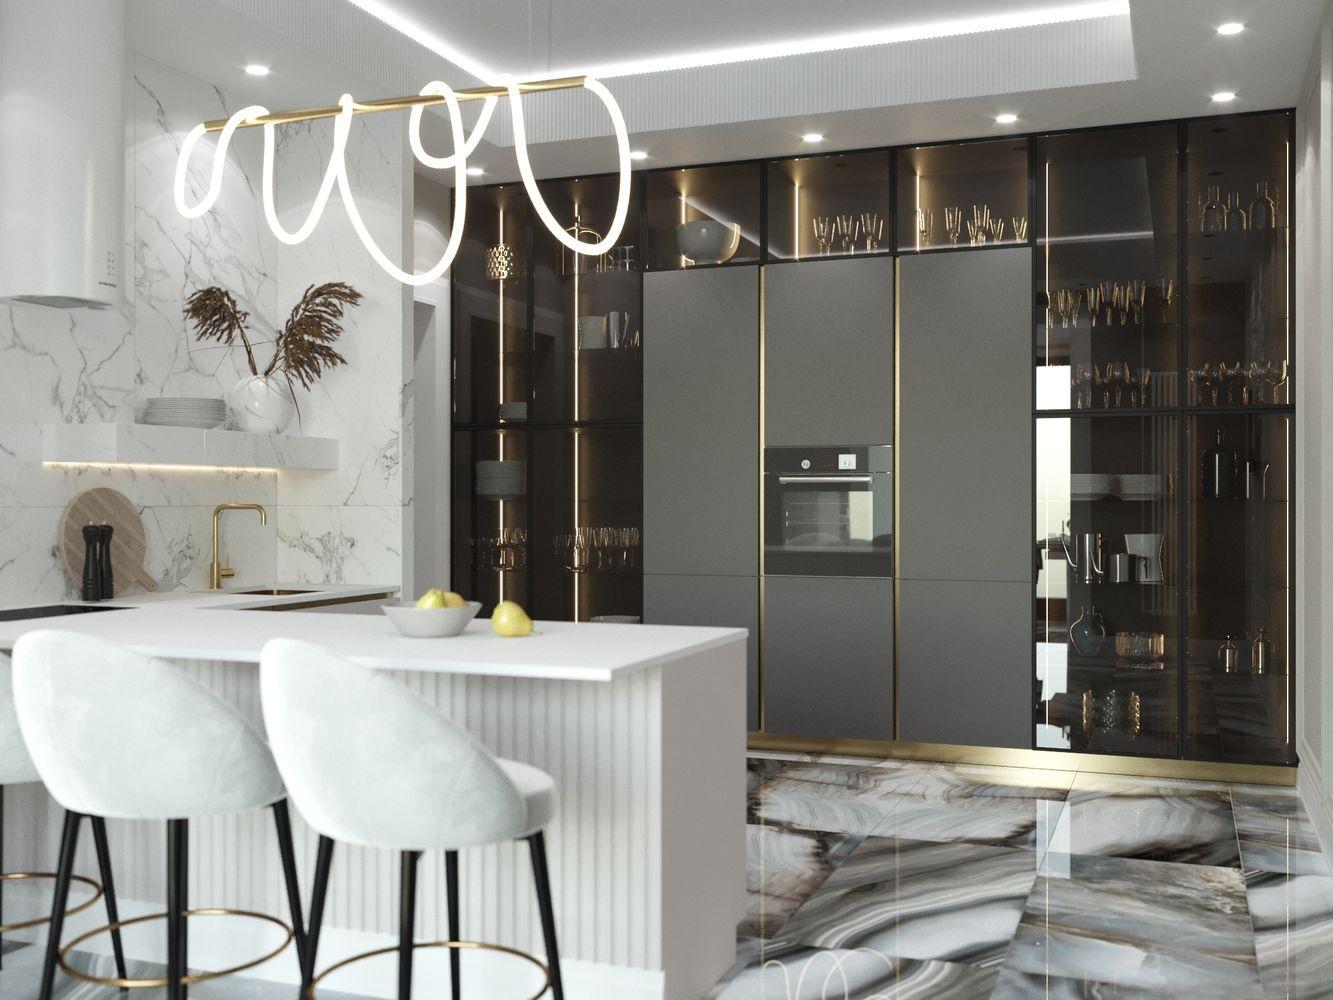 Квартира Luxury Style Красноярск